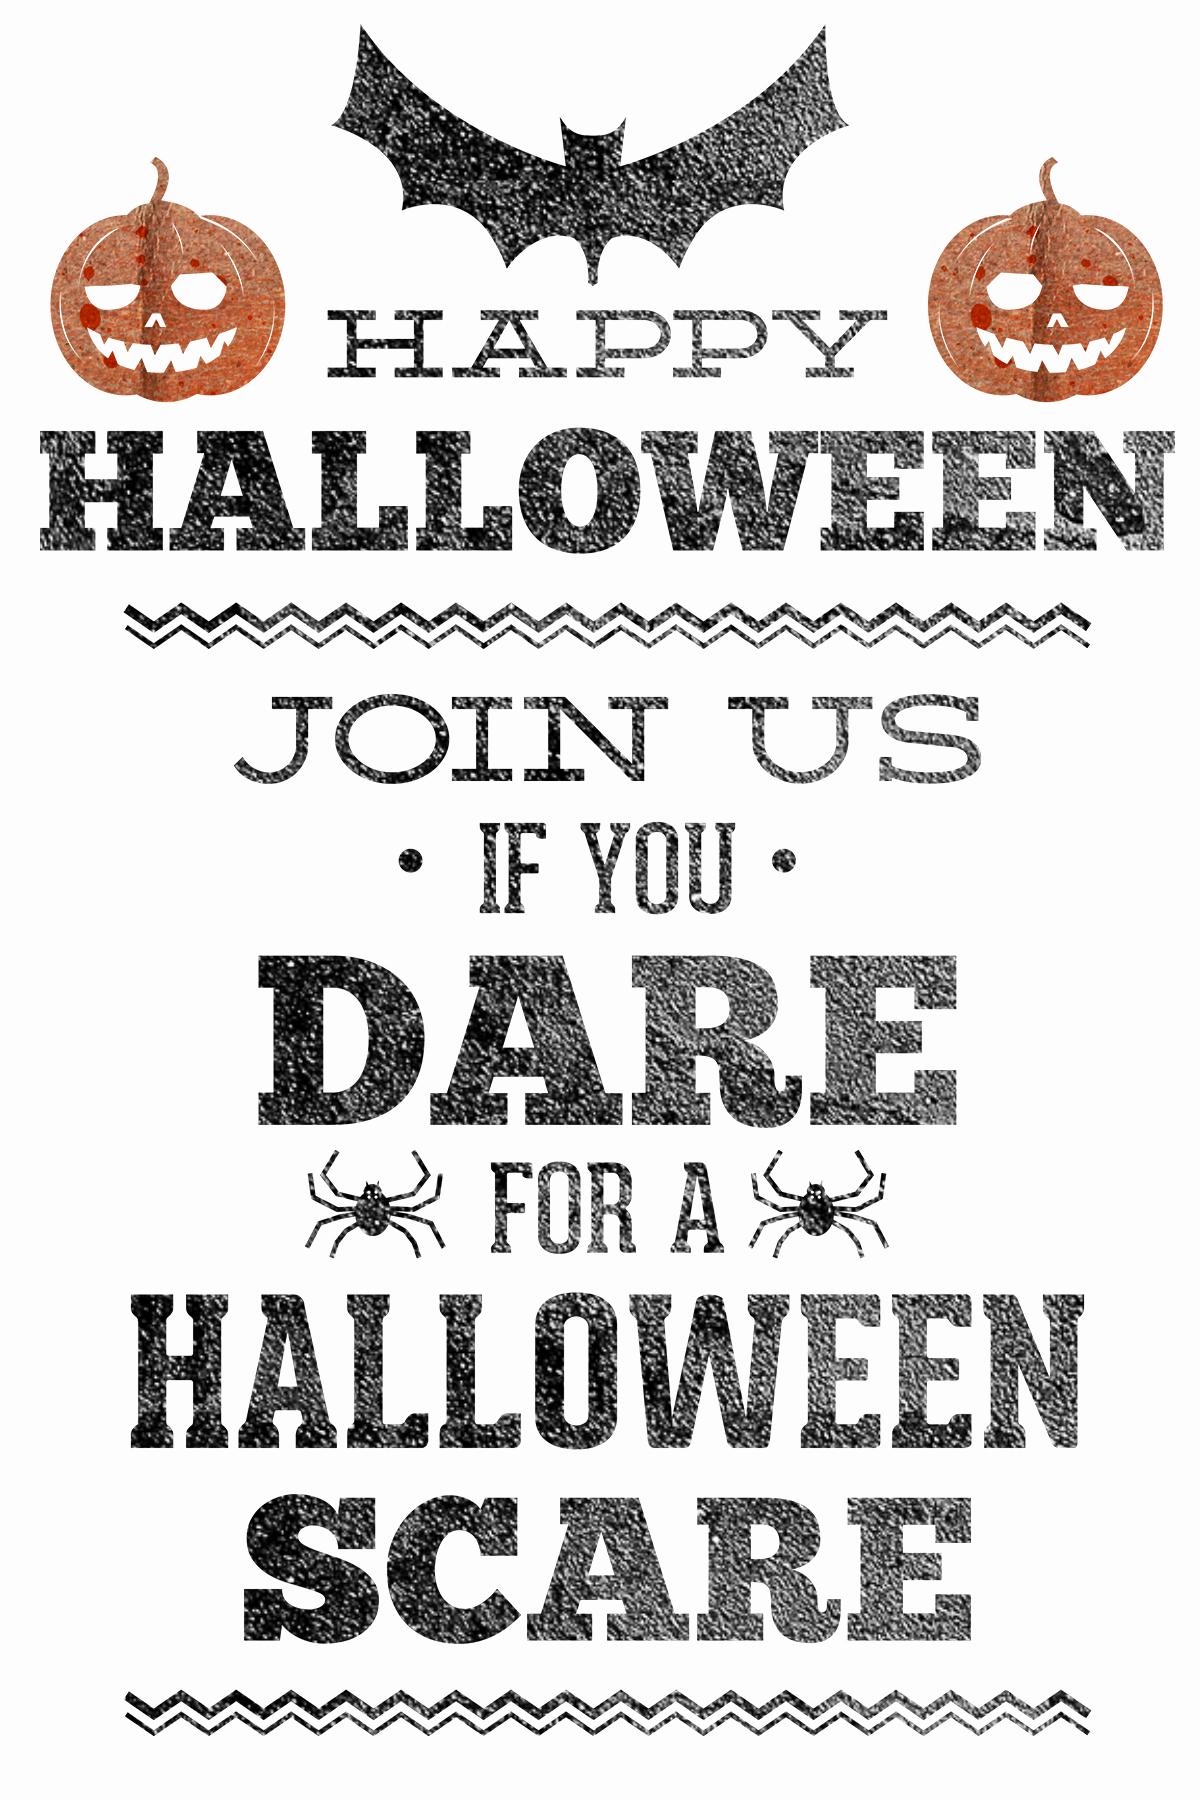 Halloween Party Invitation Template Inspirational Halloween Party Invitations Free Printable – Festival